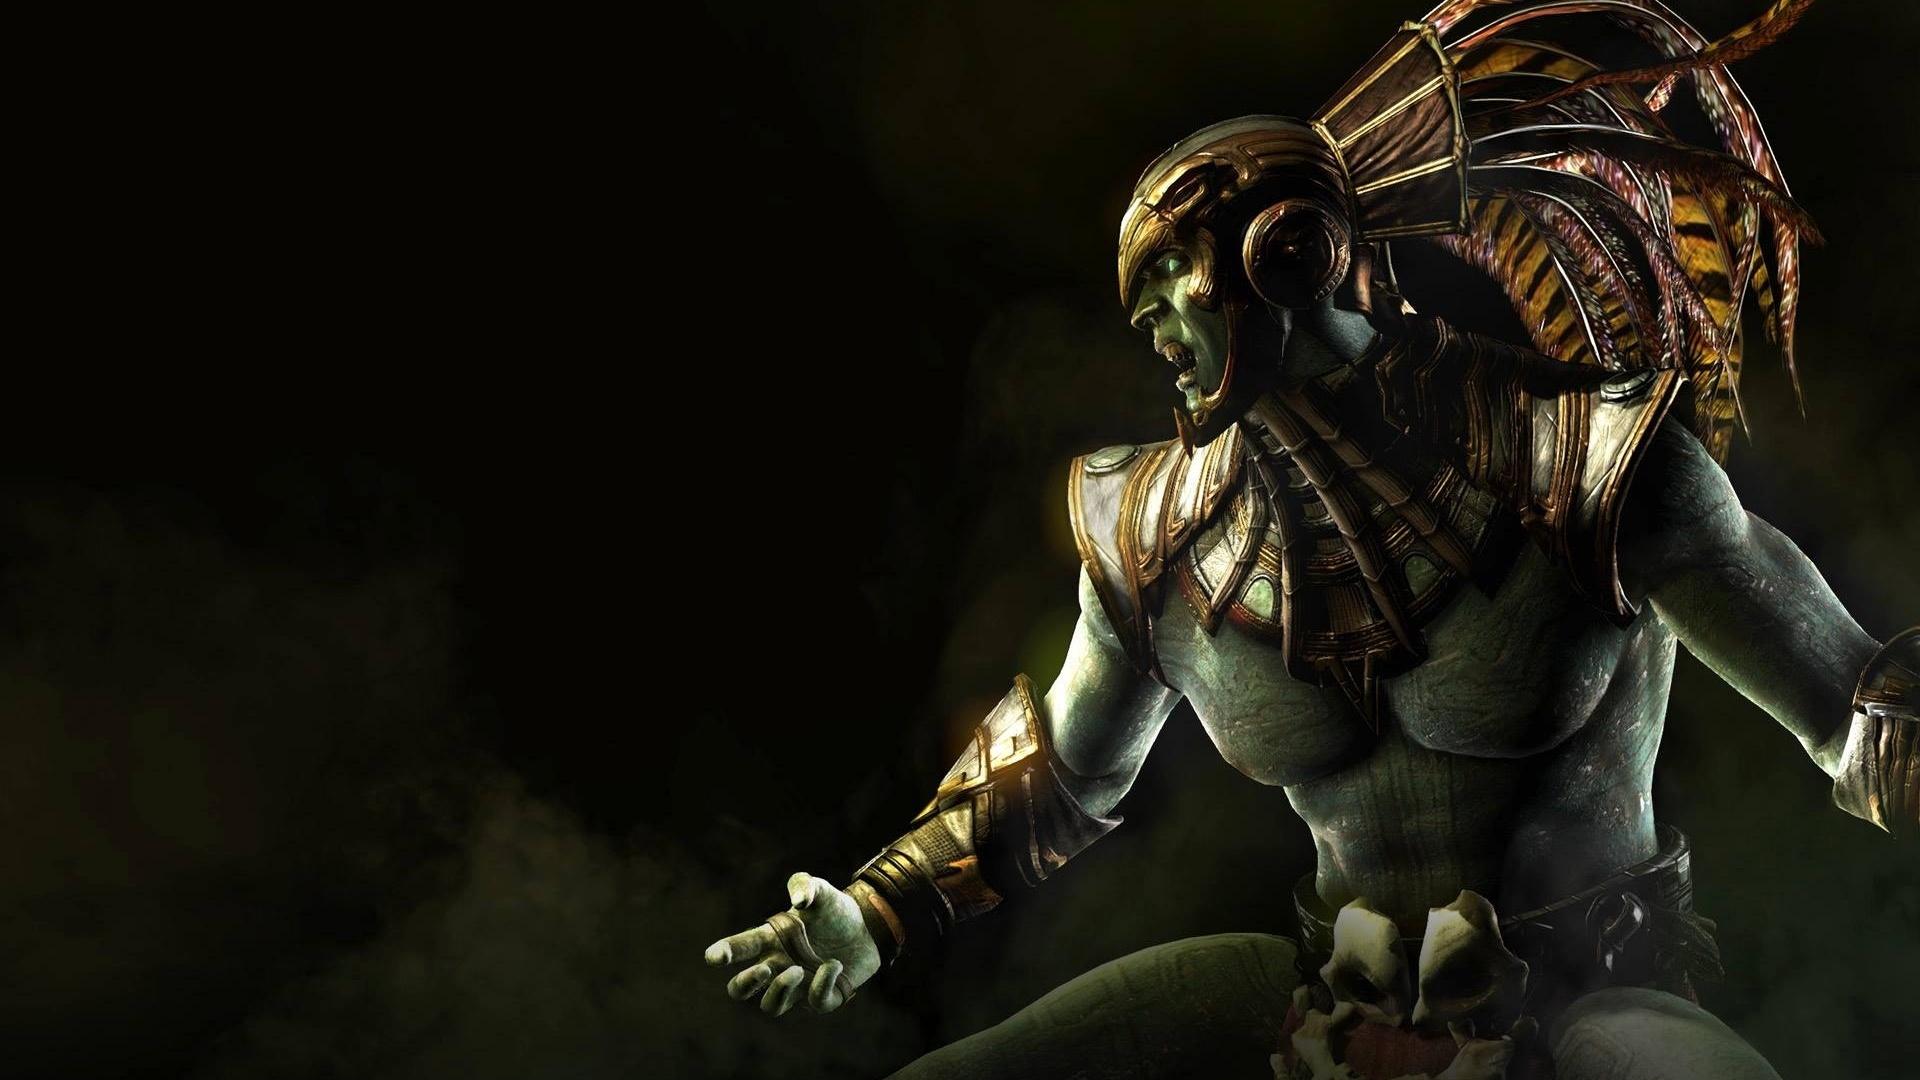 Mortal Kombat X wallpaper 6